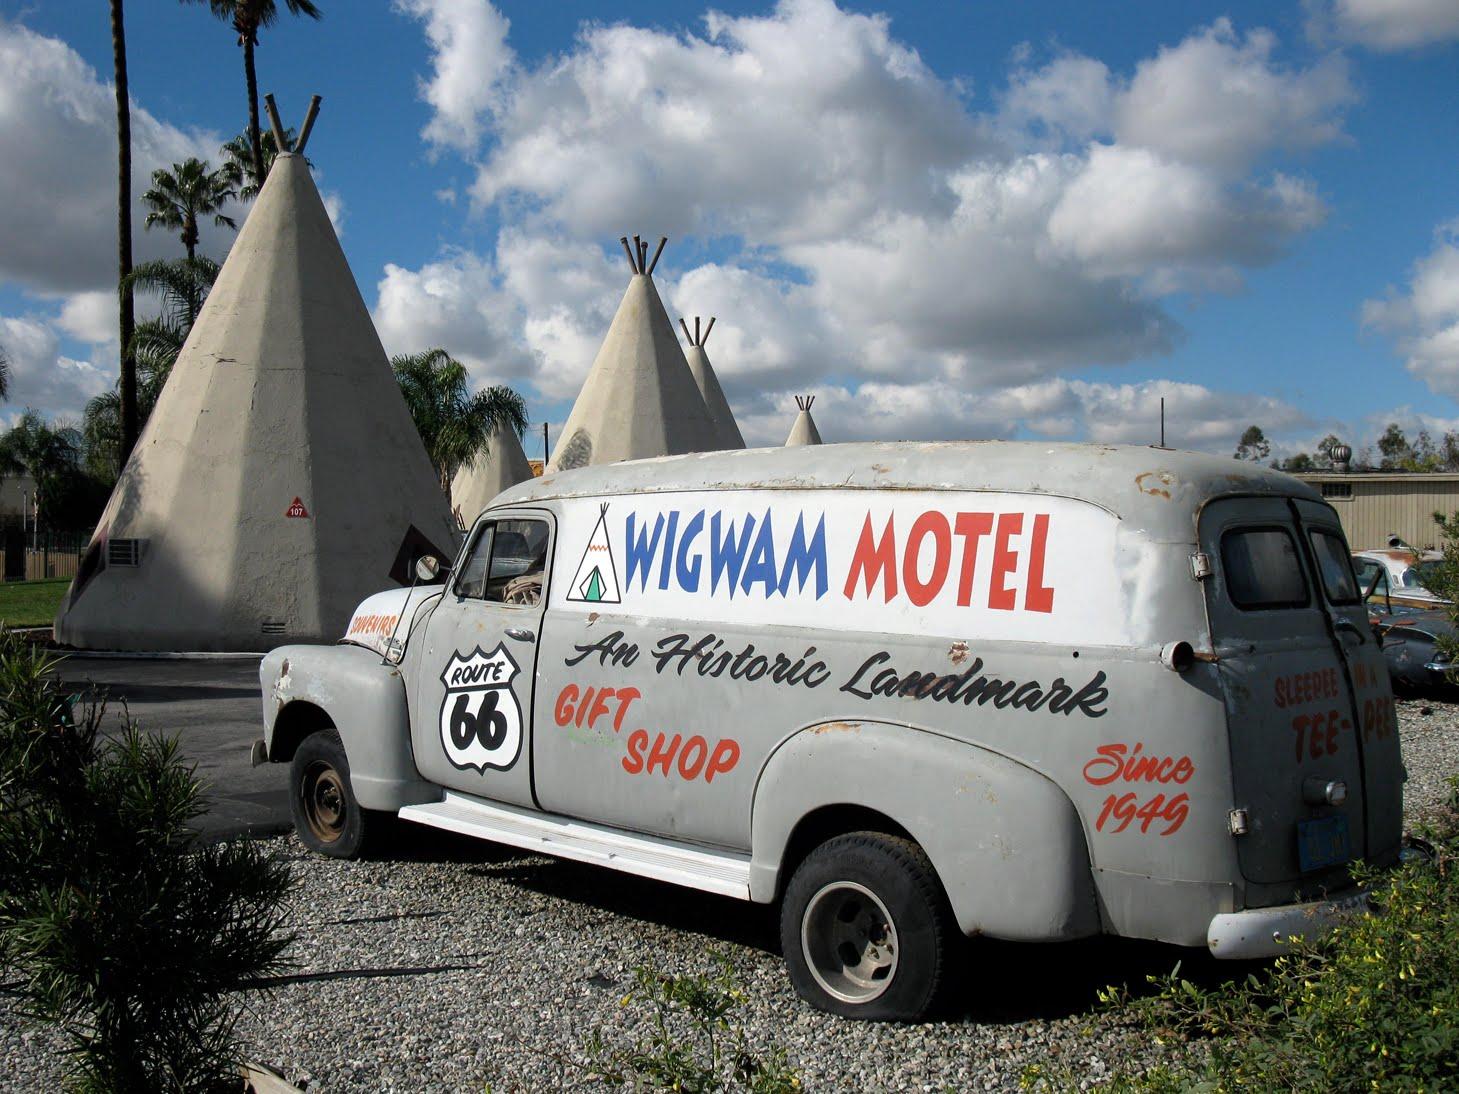 Wigwam Motel - 2720 West Foothill Boulevard, San Bernardino, California U.S.A.